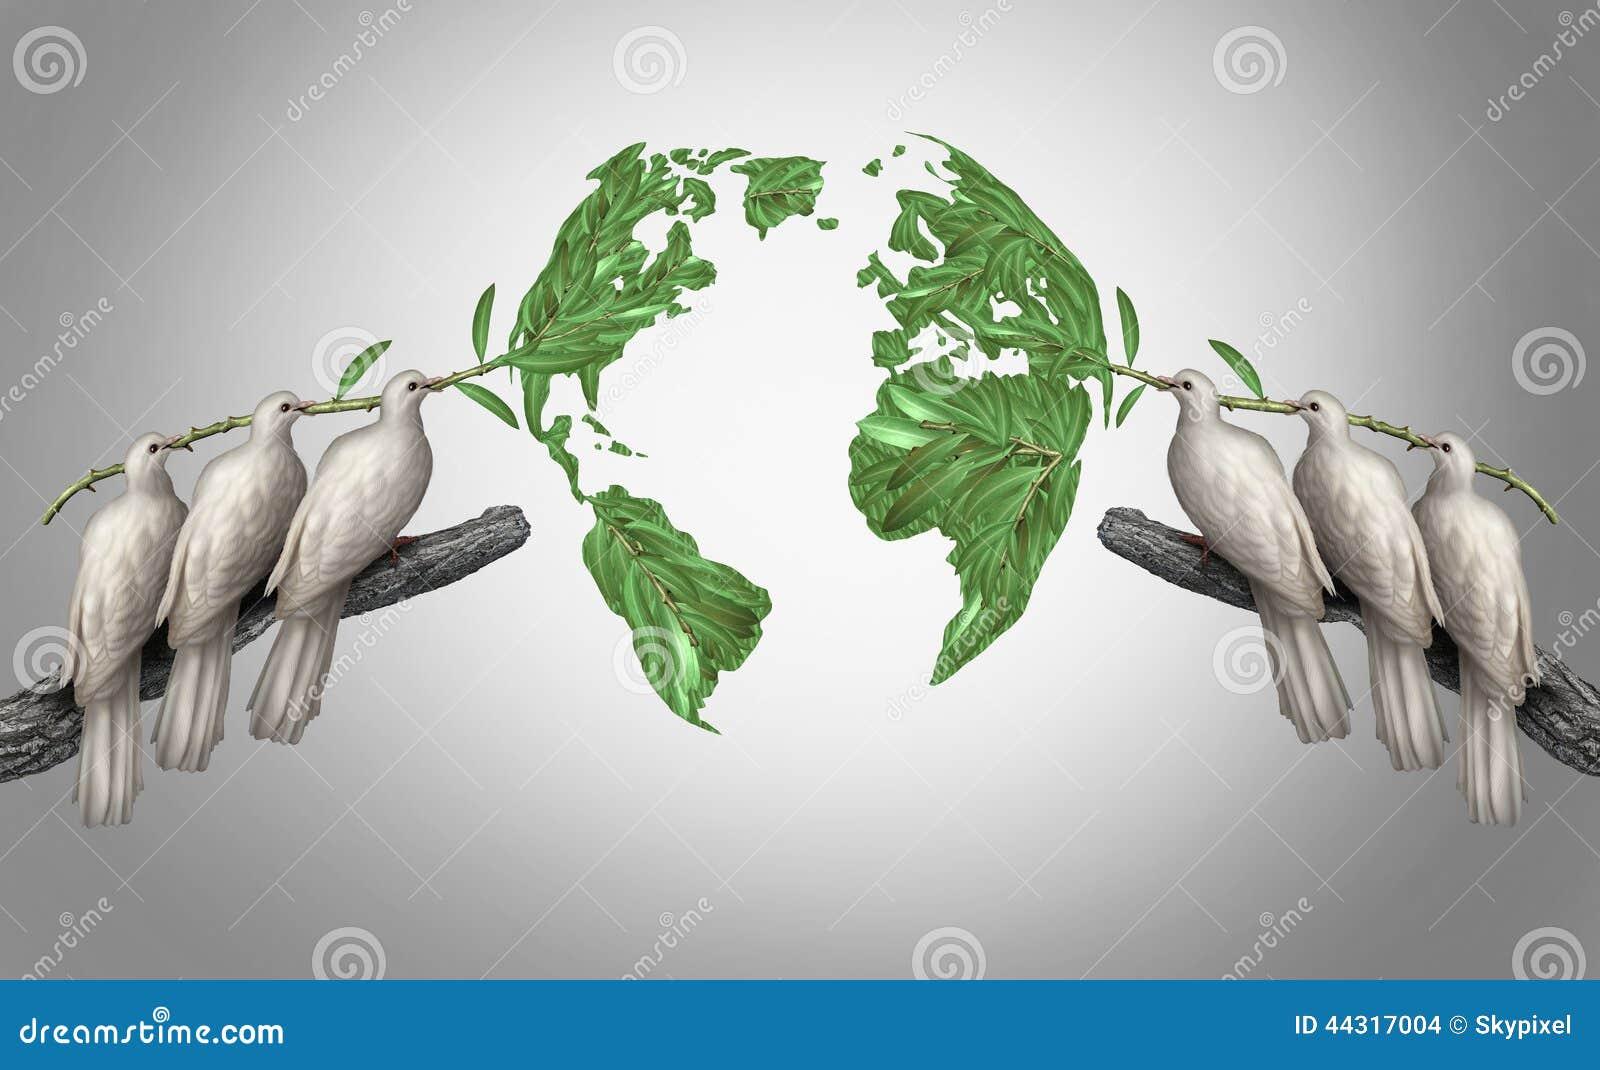 Global förbindelse